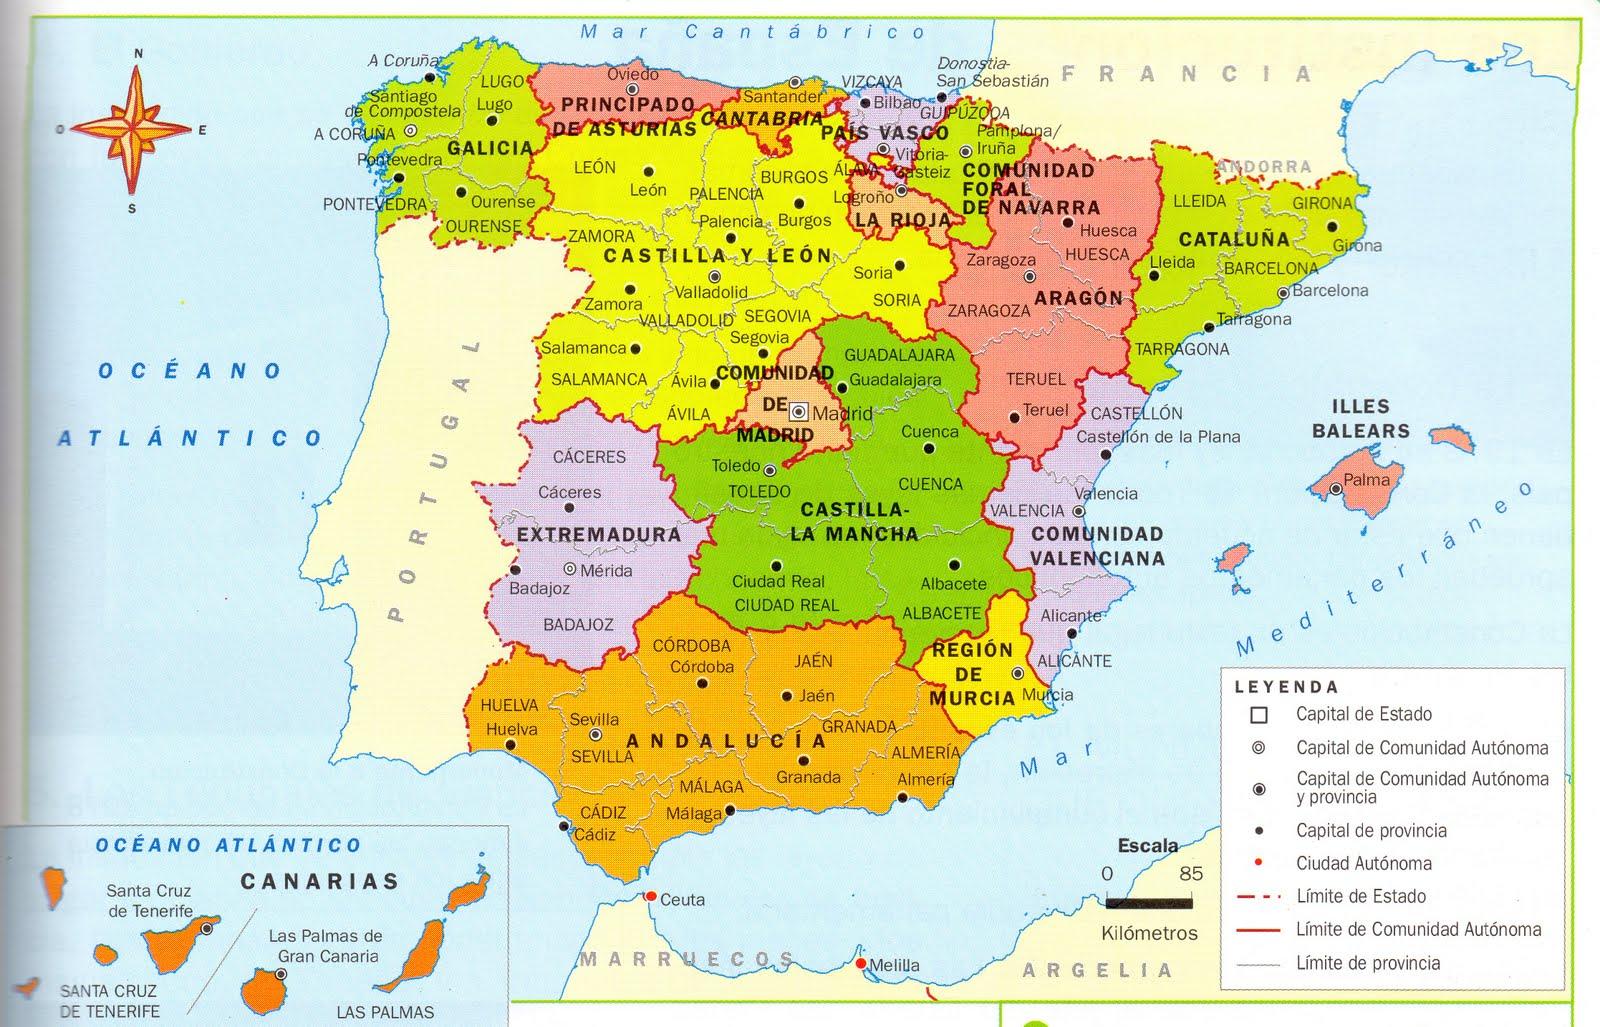 Mapa Climatico De España Mudo.Mapas De Espana Para Descargar E Imprimir Completamente